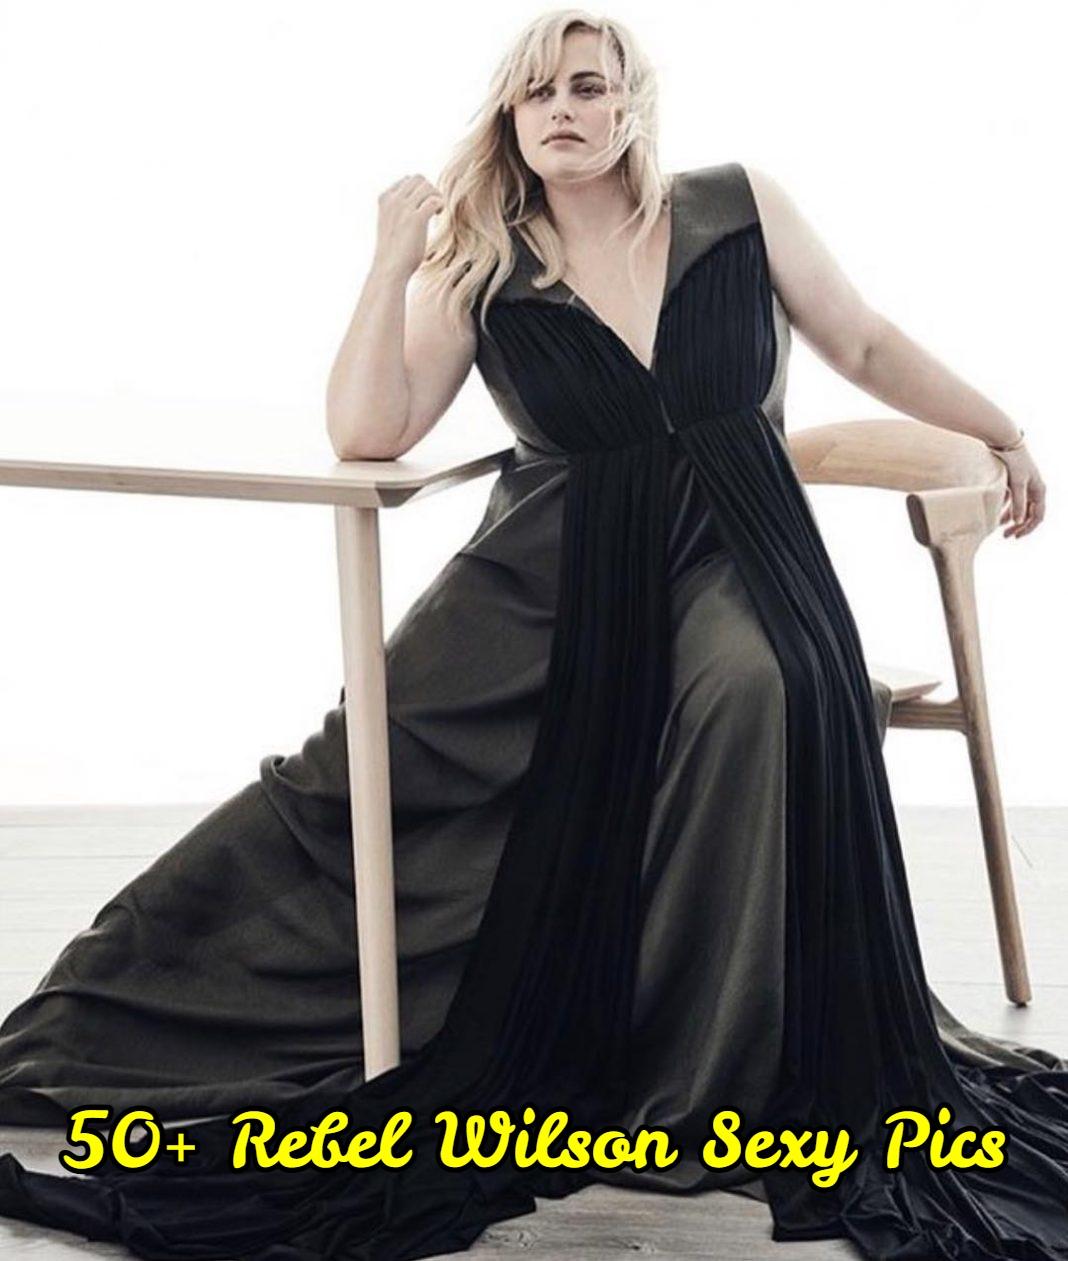 Rebel Wilson Sexy Pics